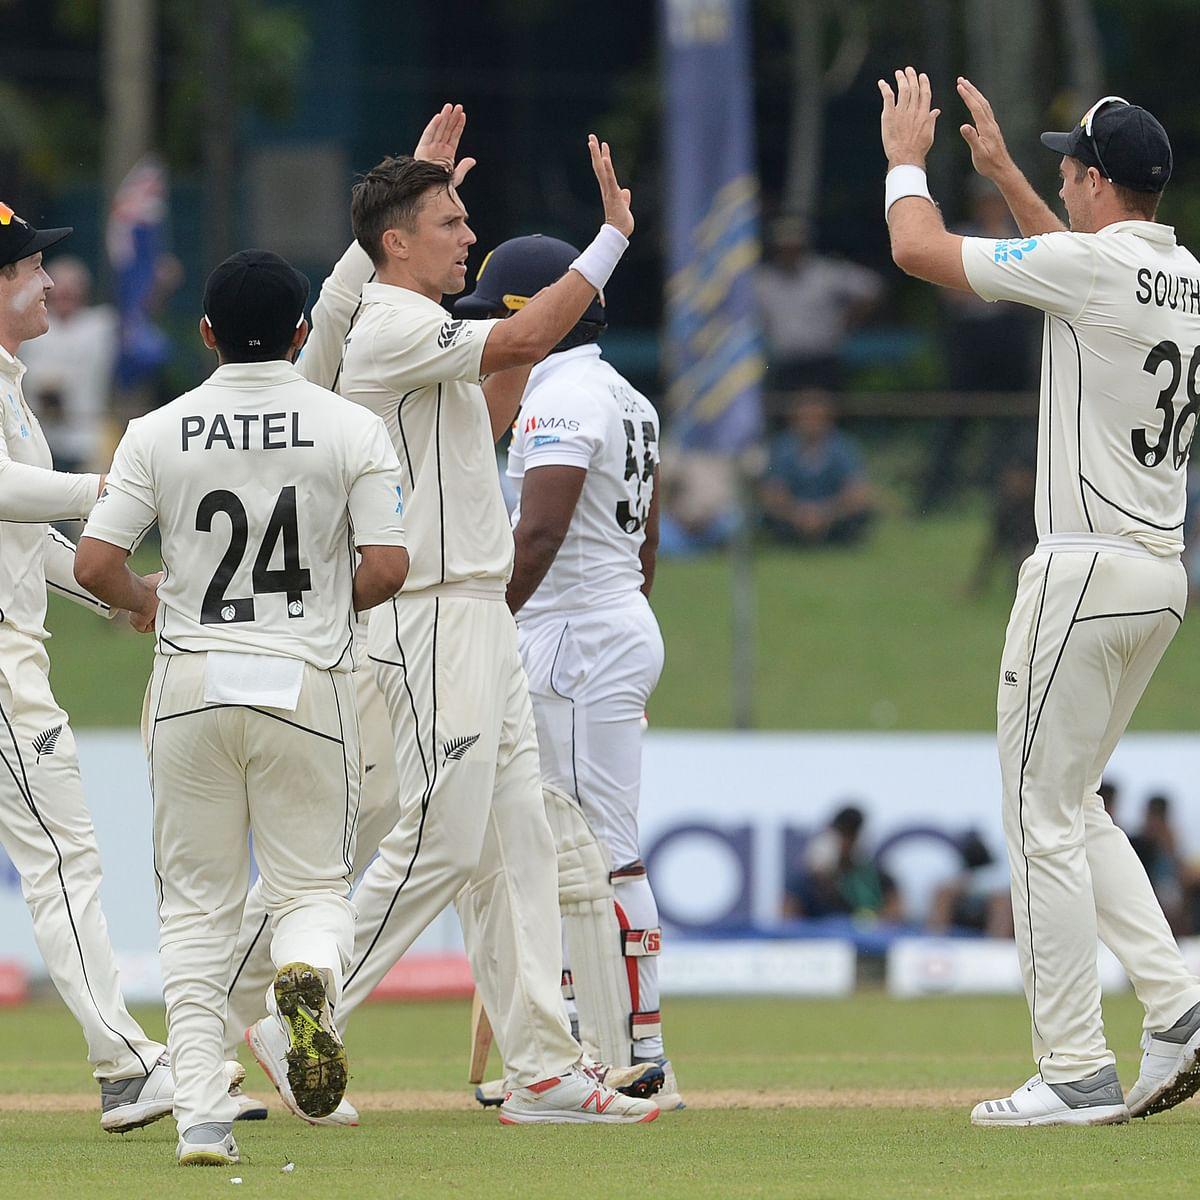 Trent Boult, Tim Southee rattle Sri Lanka in rain-hit Test match